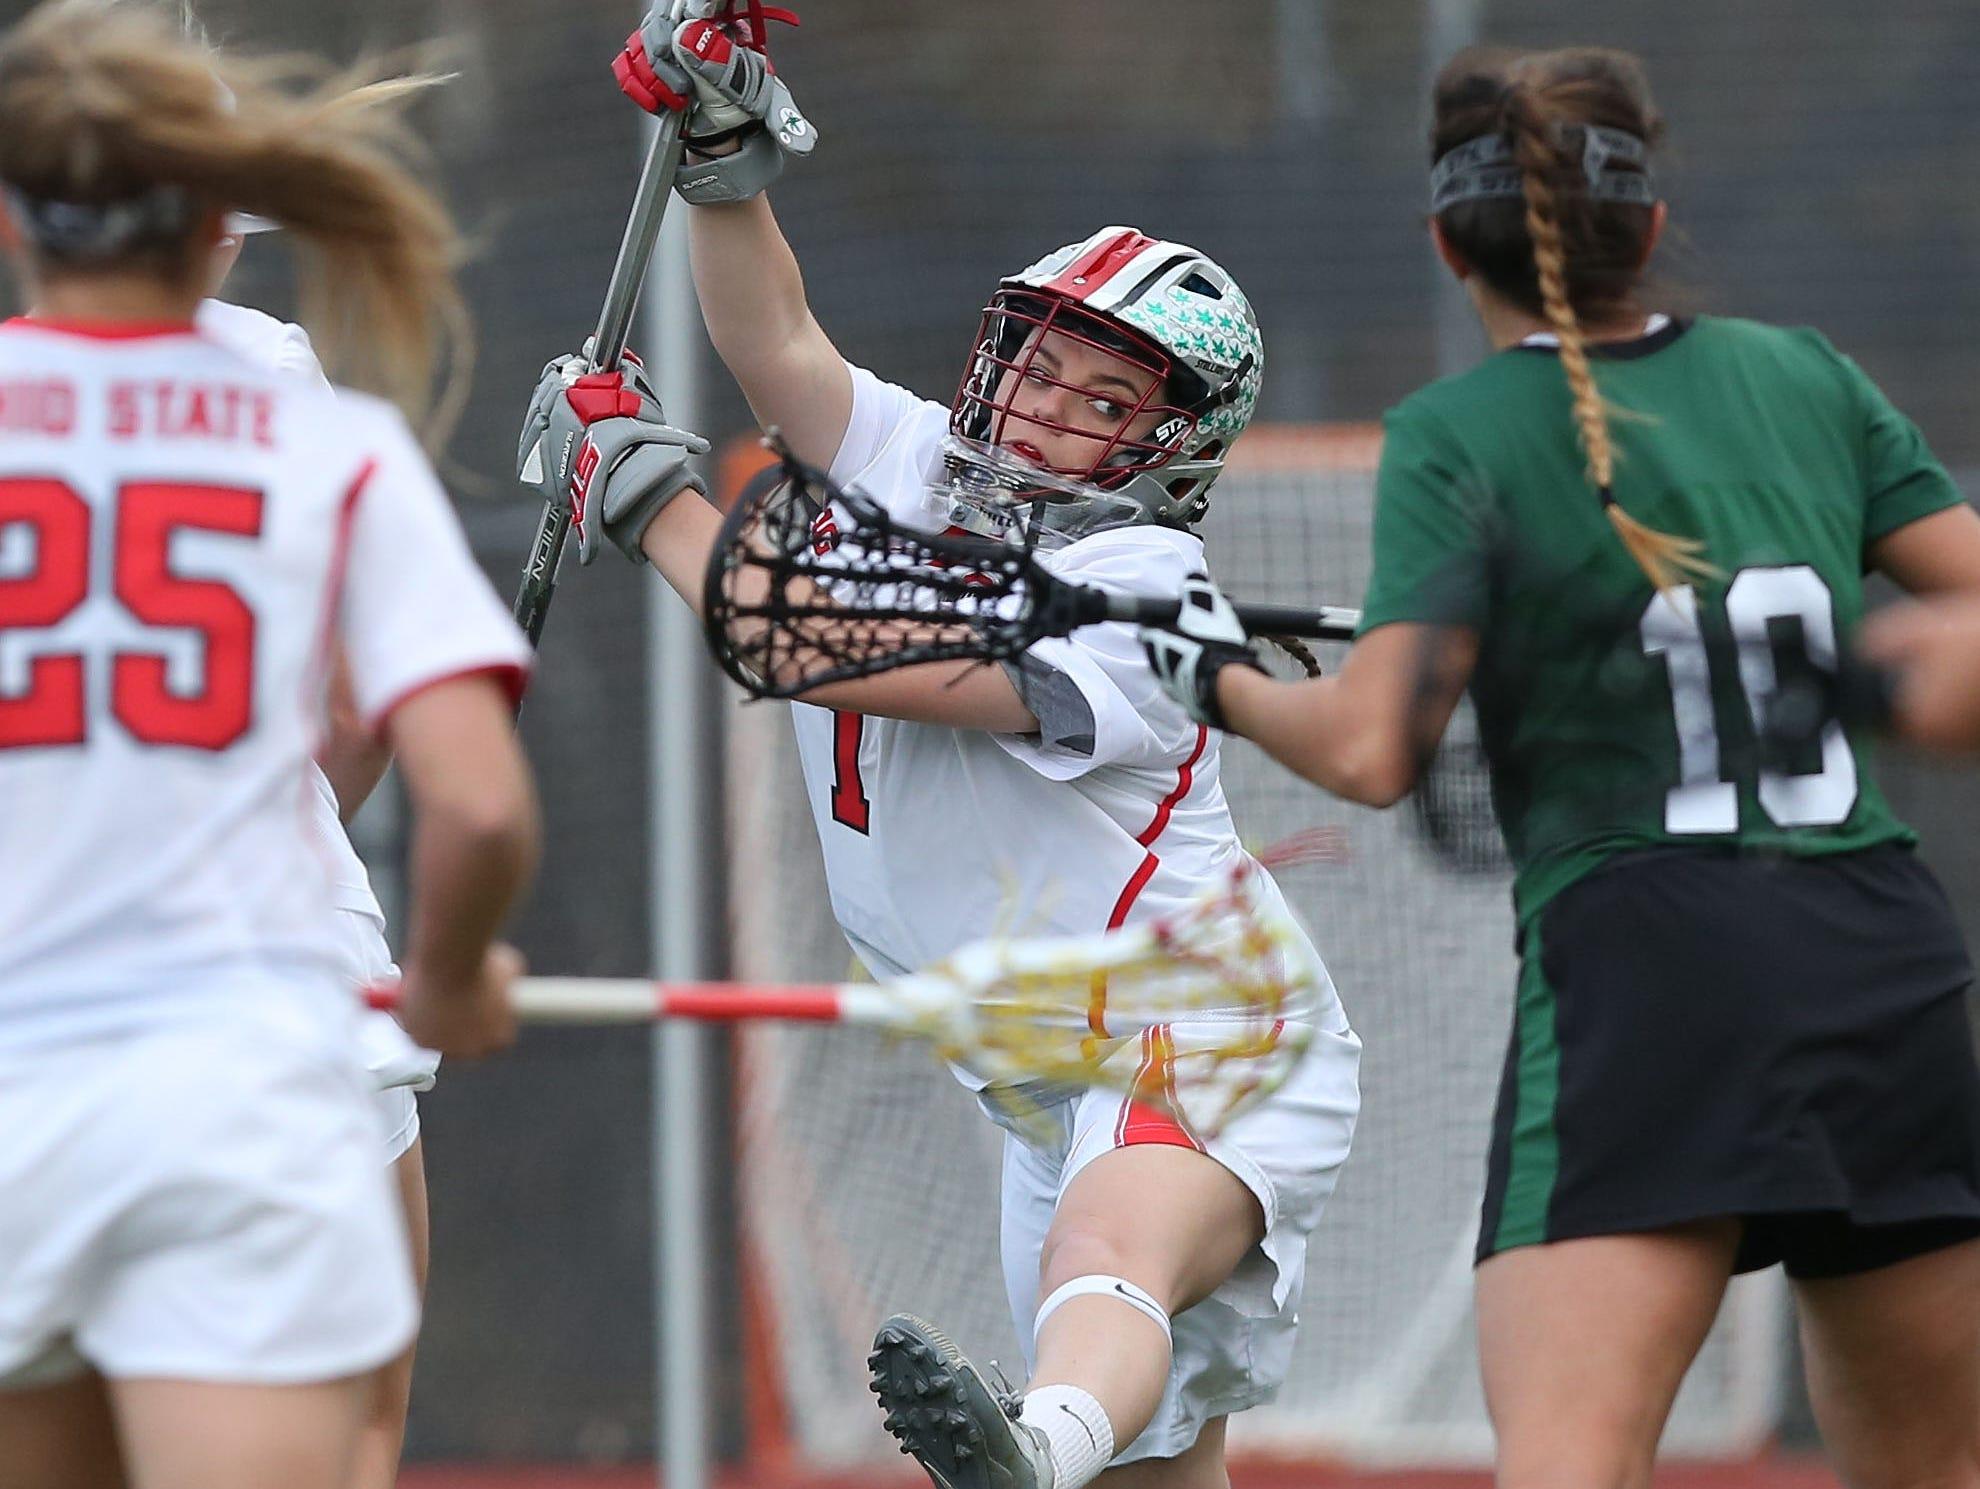 Ohio State goalie Katie Frederick (1) blocks a shot during game against Binghamton at Yorktown High School March 25, 2016. Ohio State won the game 10-5. Frederick is a graduate of Yorktown High School.